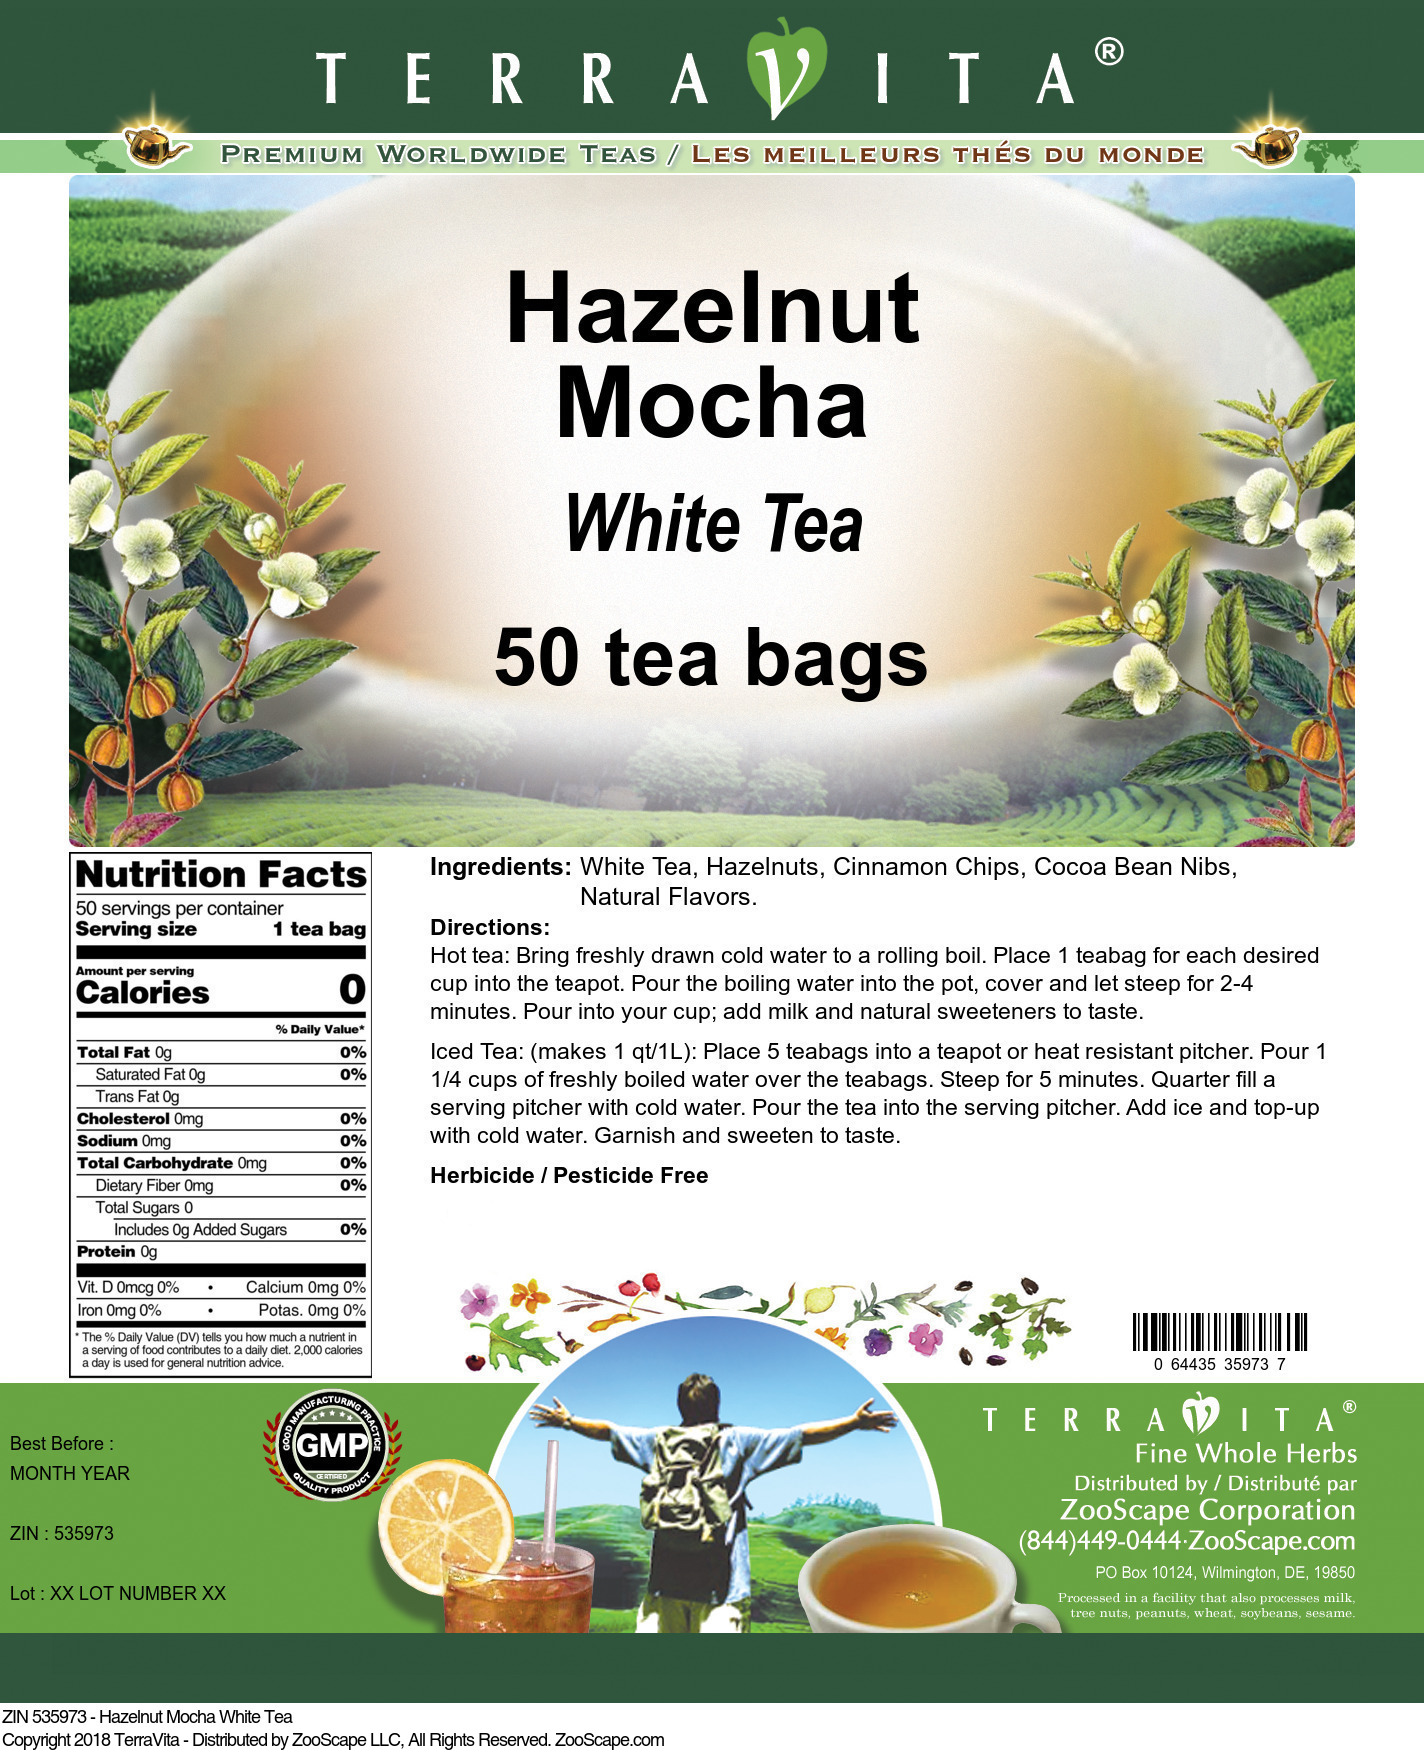 Hazelnut Mocha White Tea